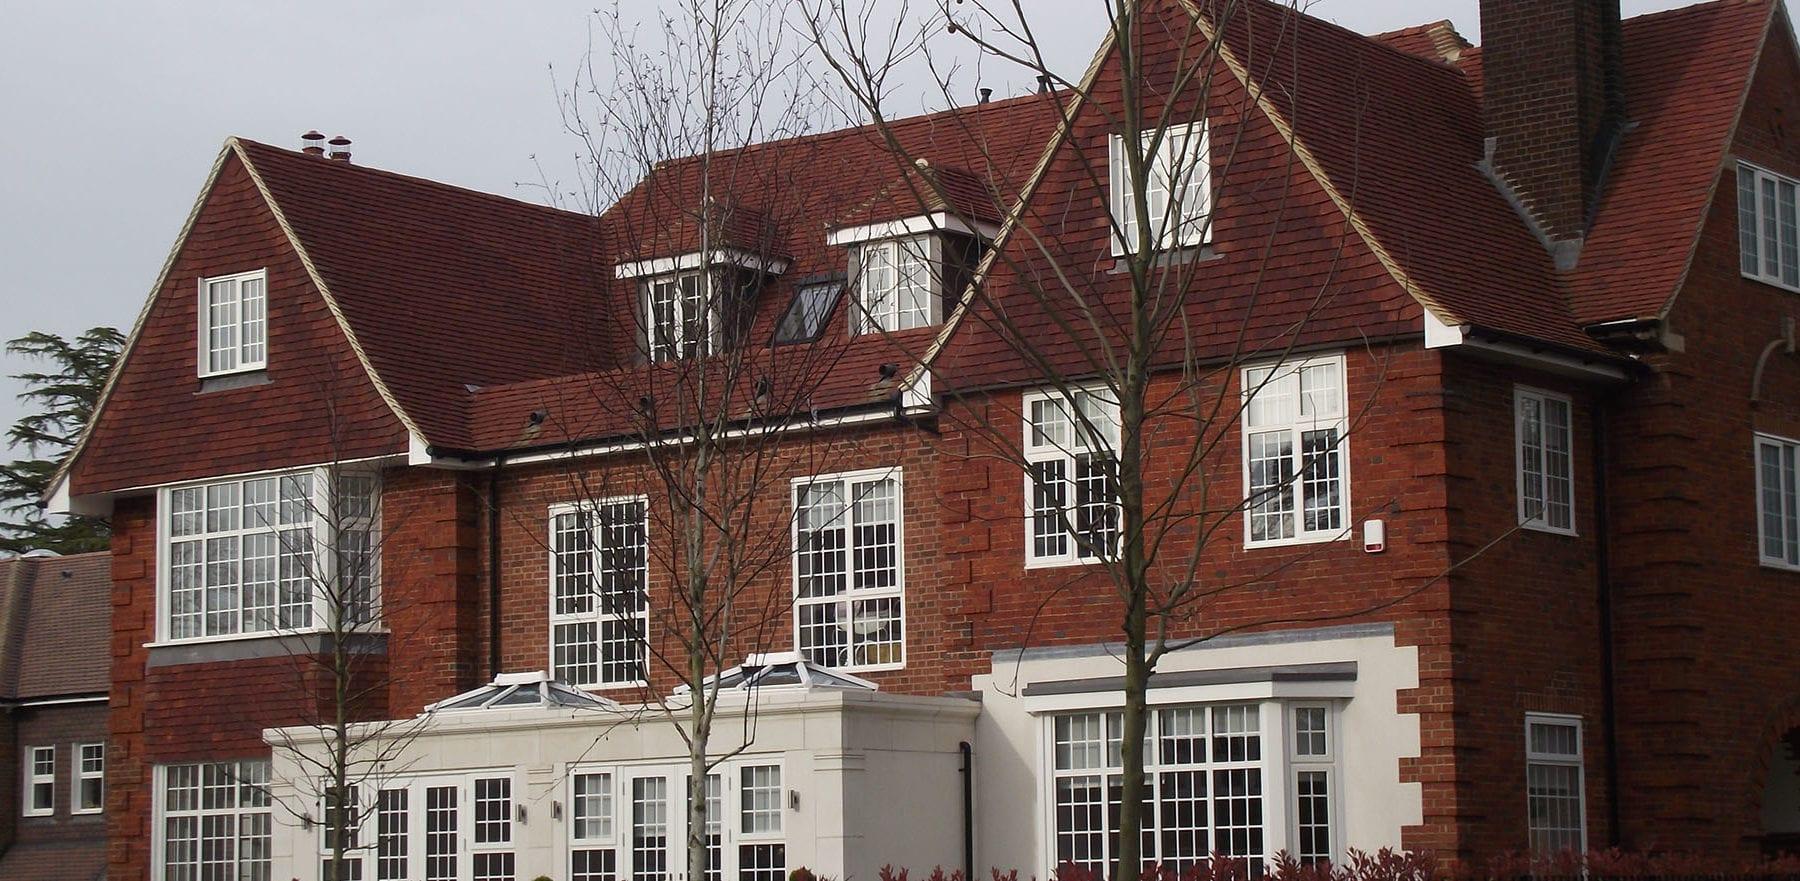 Lifestiles - Handmade Heather Clay Roof Tiles - Bickley, England 3